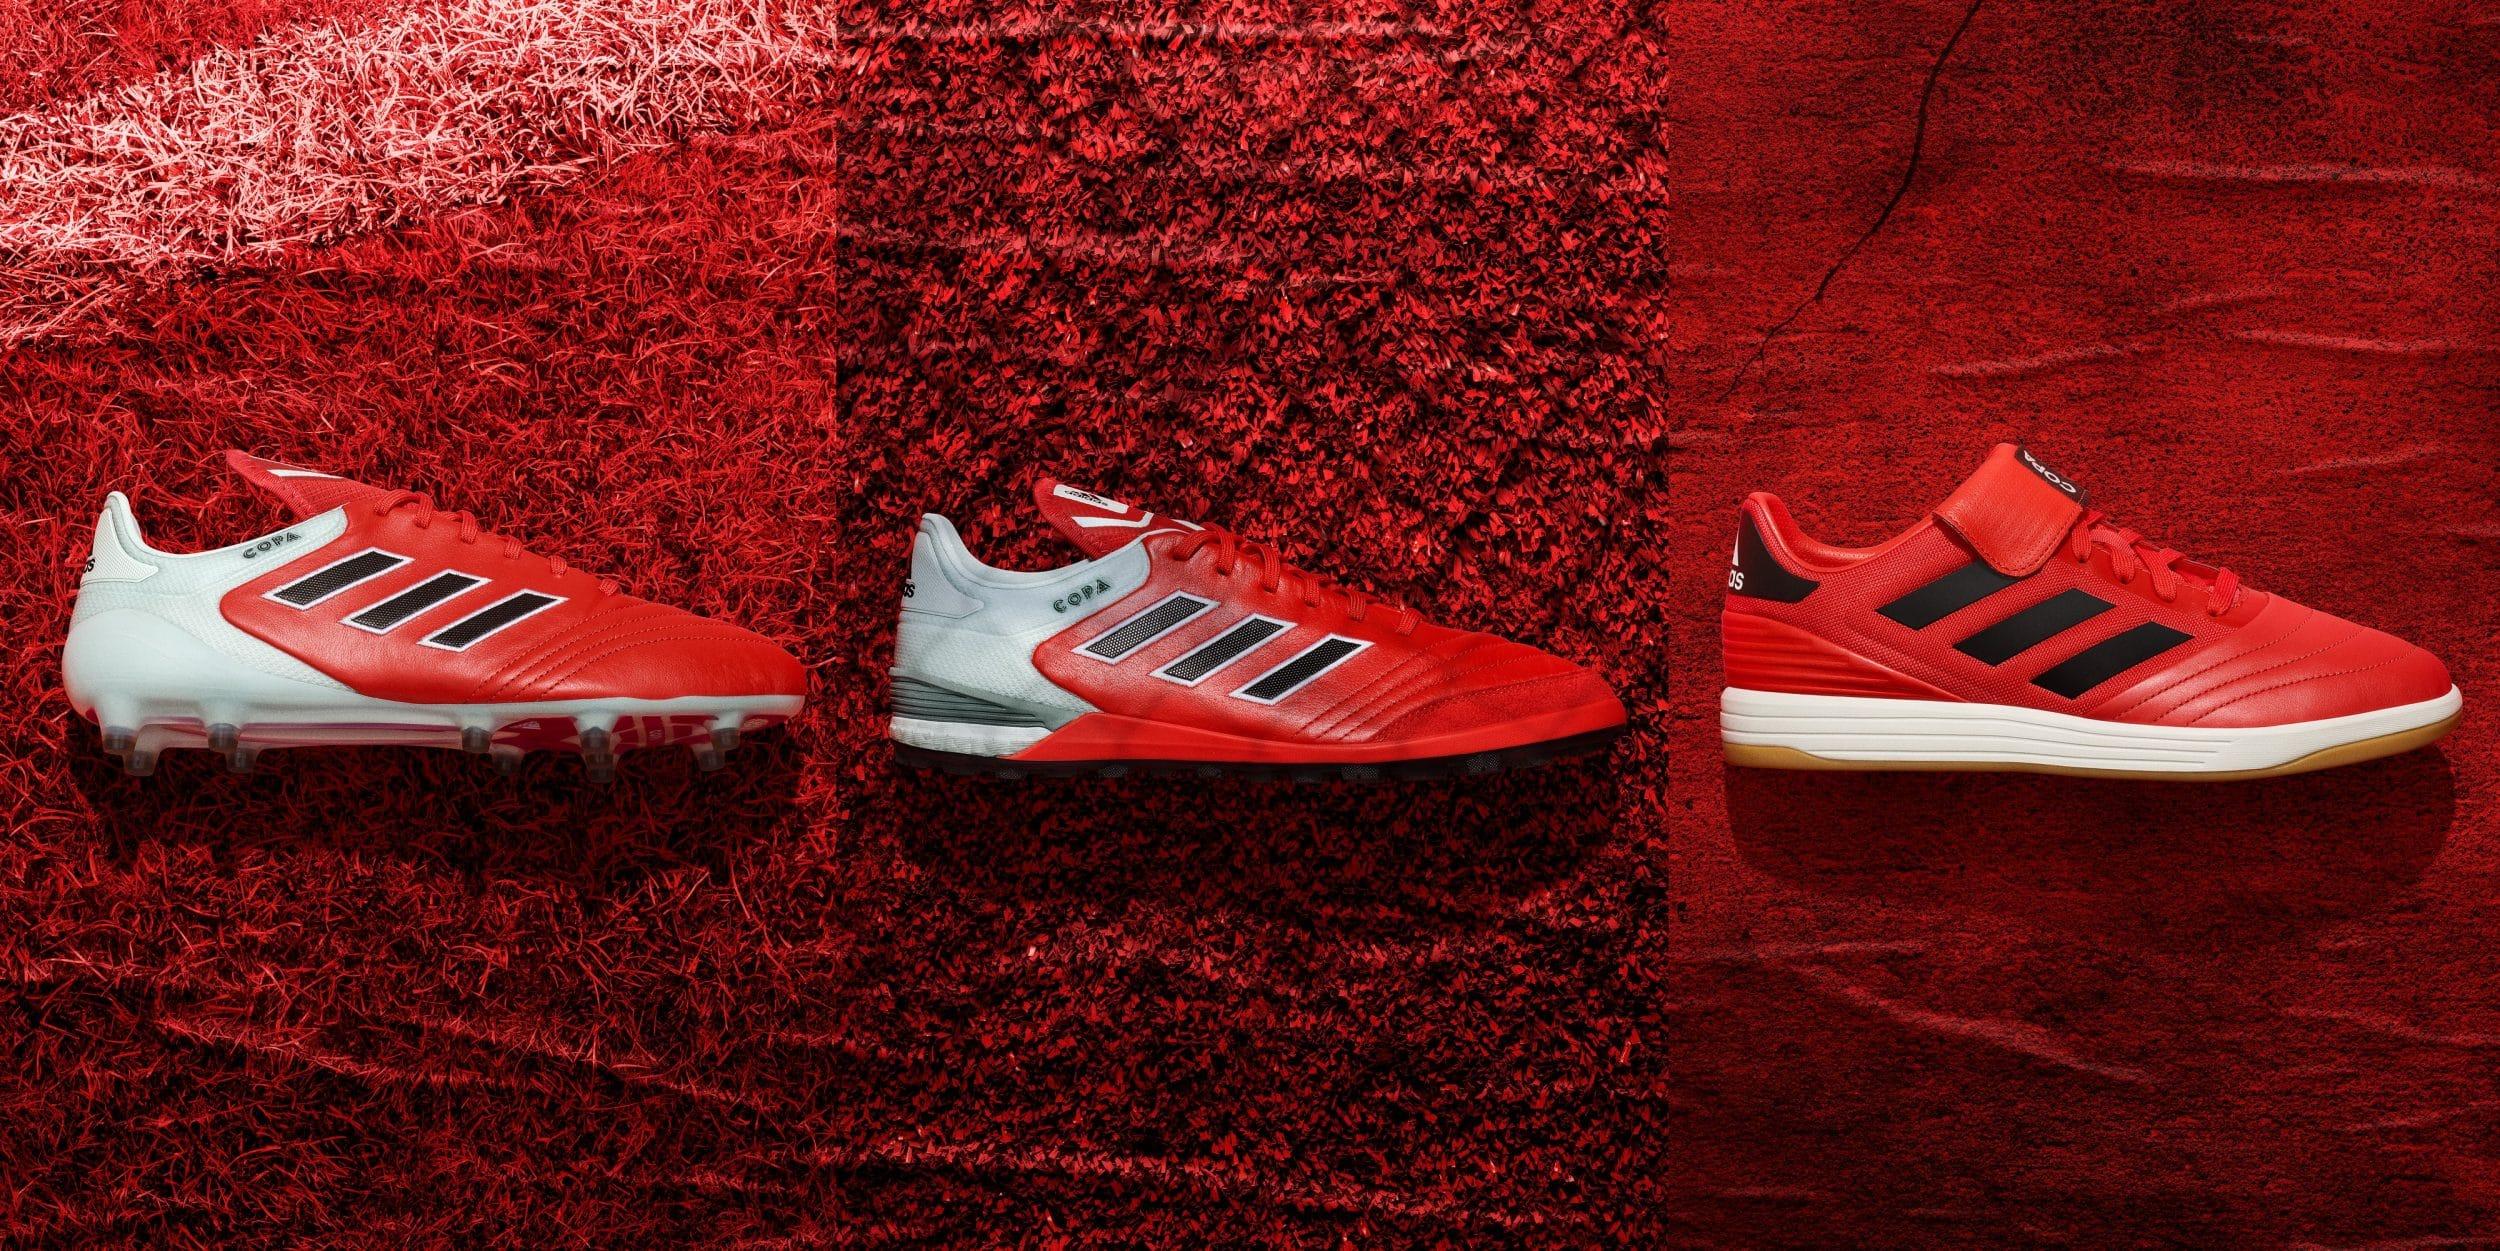 chaussure-football-adidas-copa17-novembre-2016-2-min